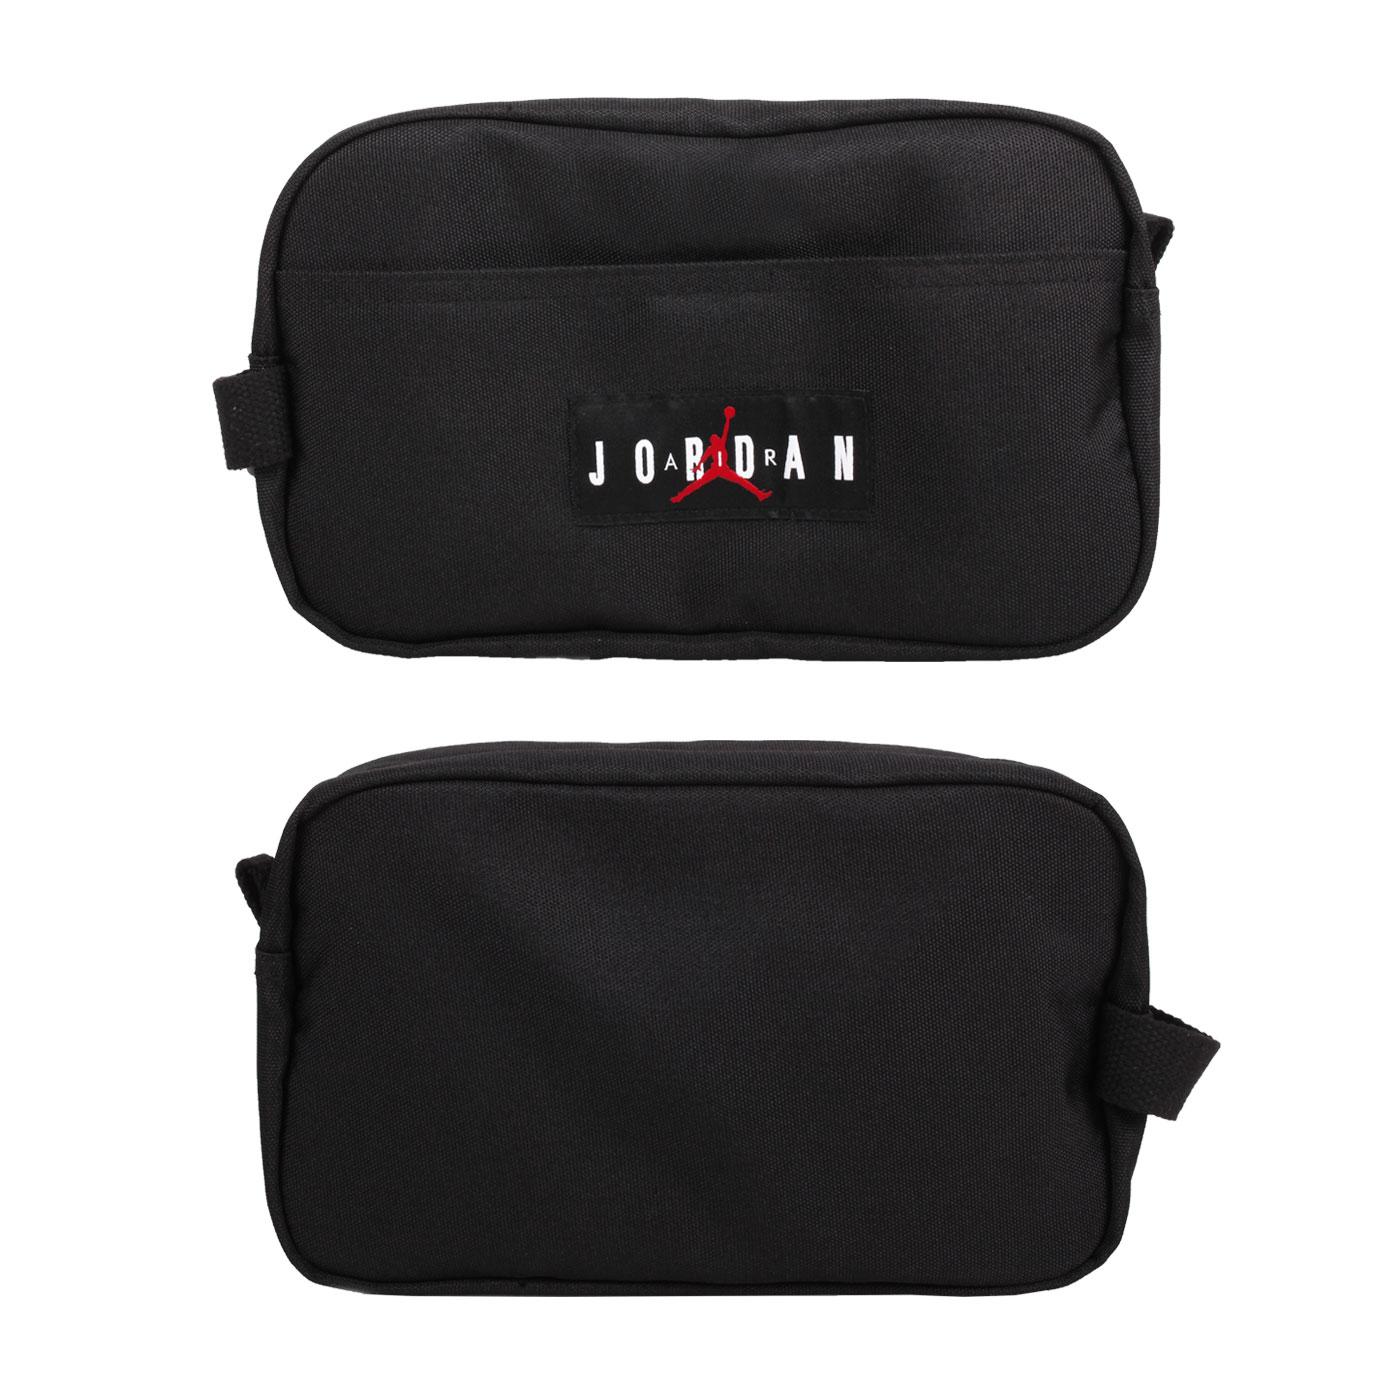 NIKE JORDAN 旅行收納包 JD2043018AD-001